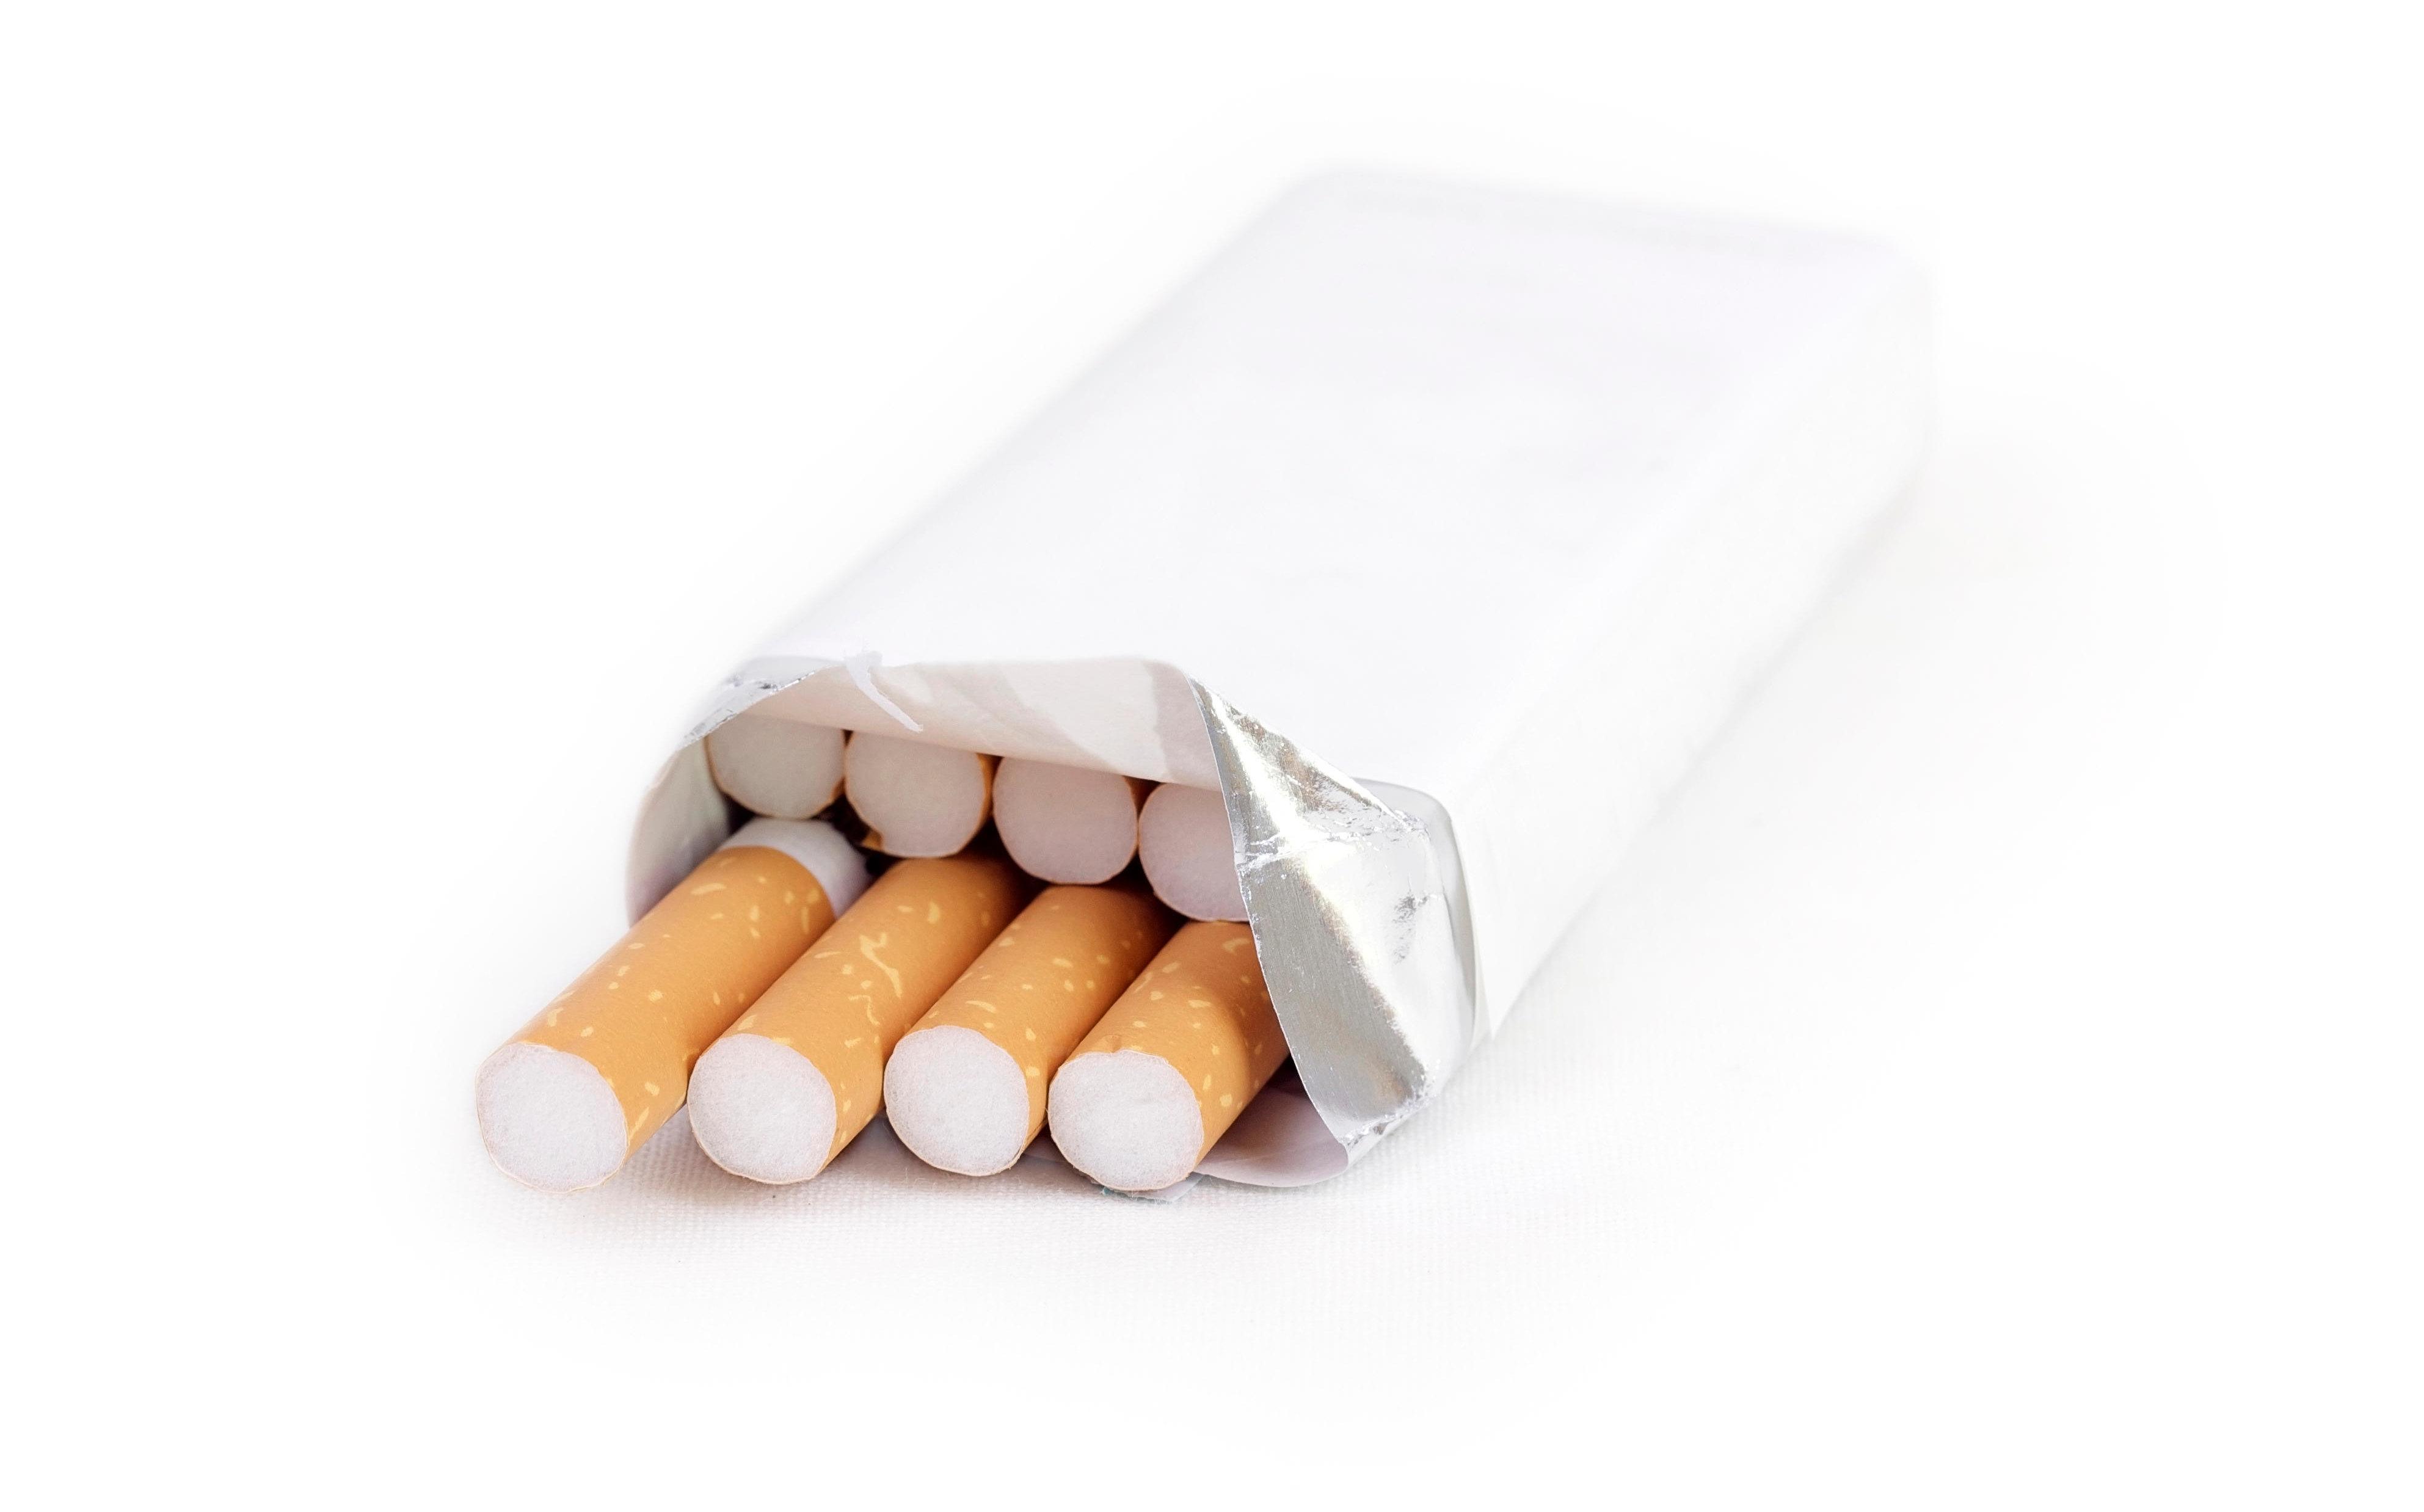 esquire сигареты купить